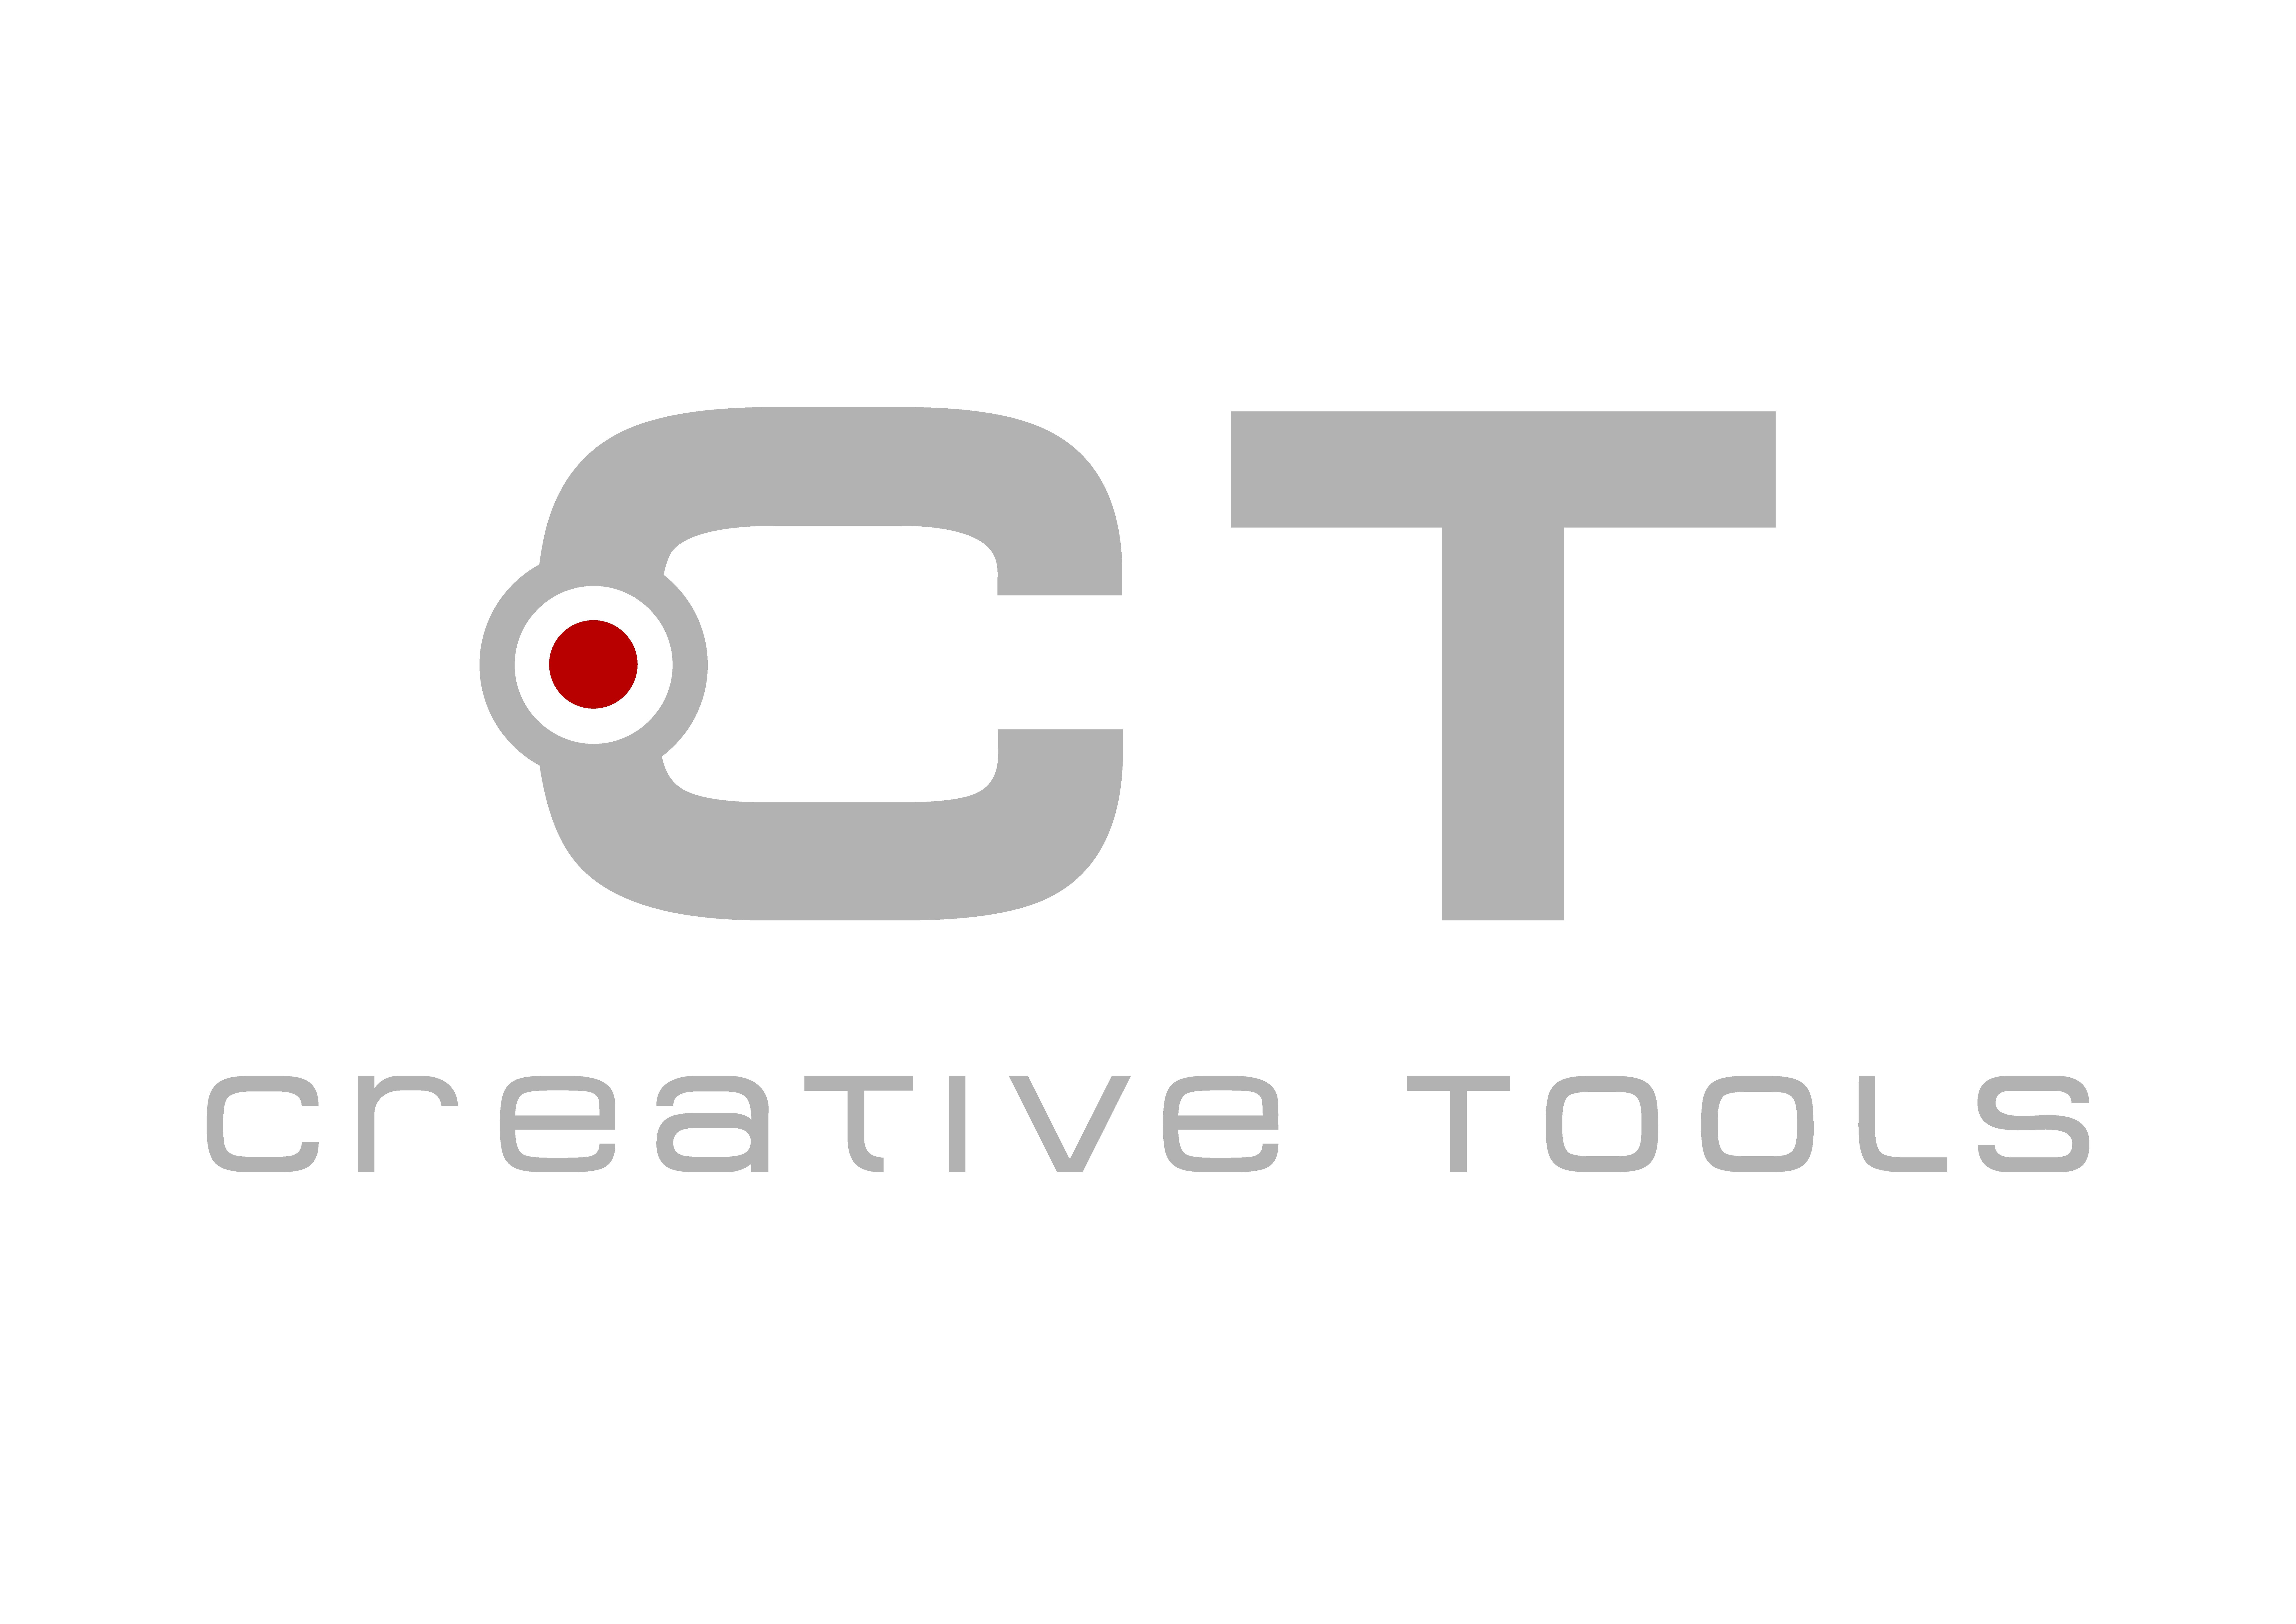 kopia_av_creative_tools_-_logotype_-_color_10524_x_7441_pxl_0.png